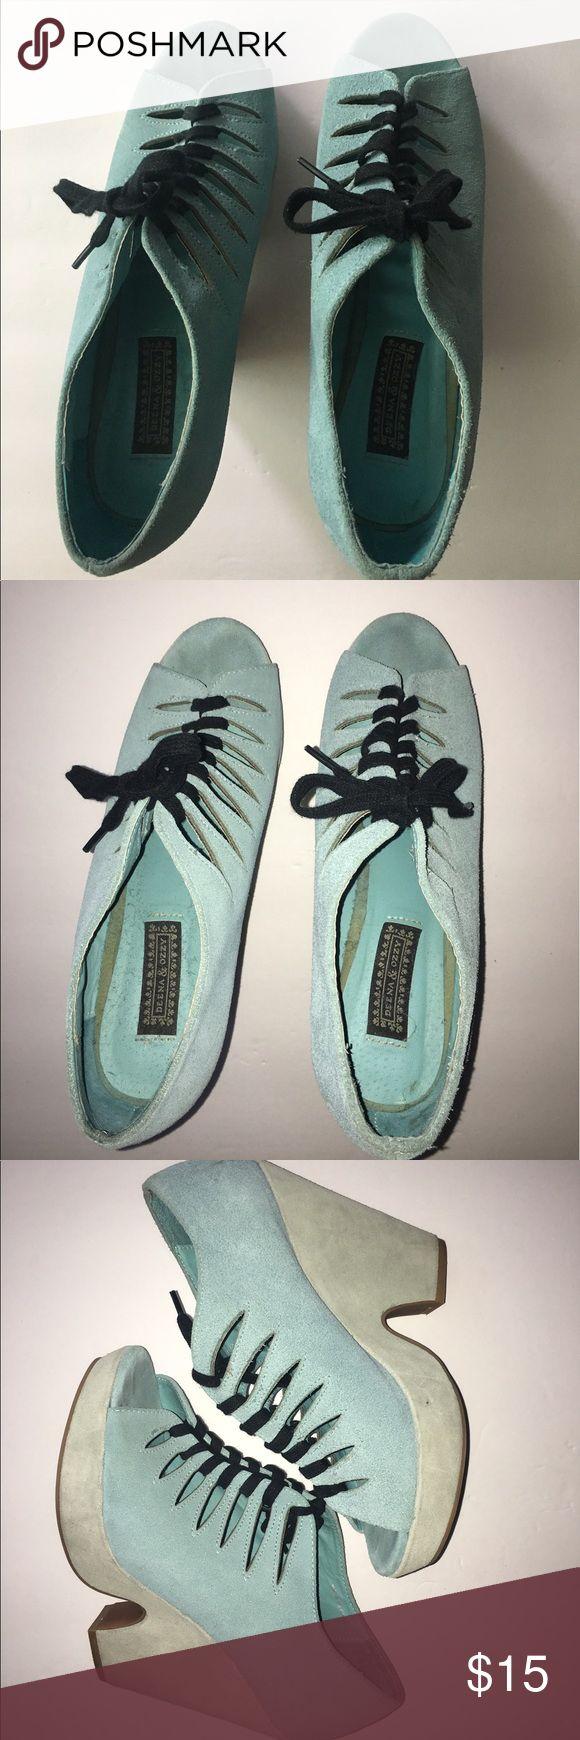 Deena & Ozzy Lace Up Wedges Deena & Ozzy Lace Up Wedges. Size: 7. Gently Used Deena & Ozzy Shoes Wedges